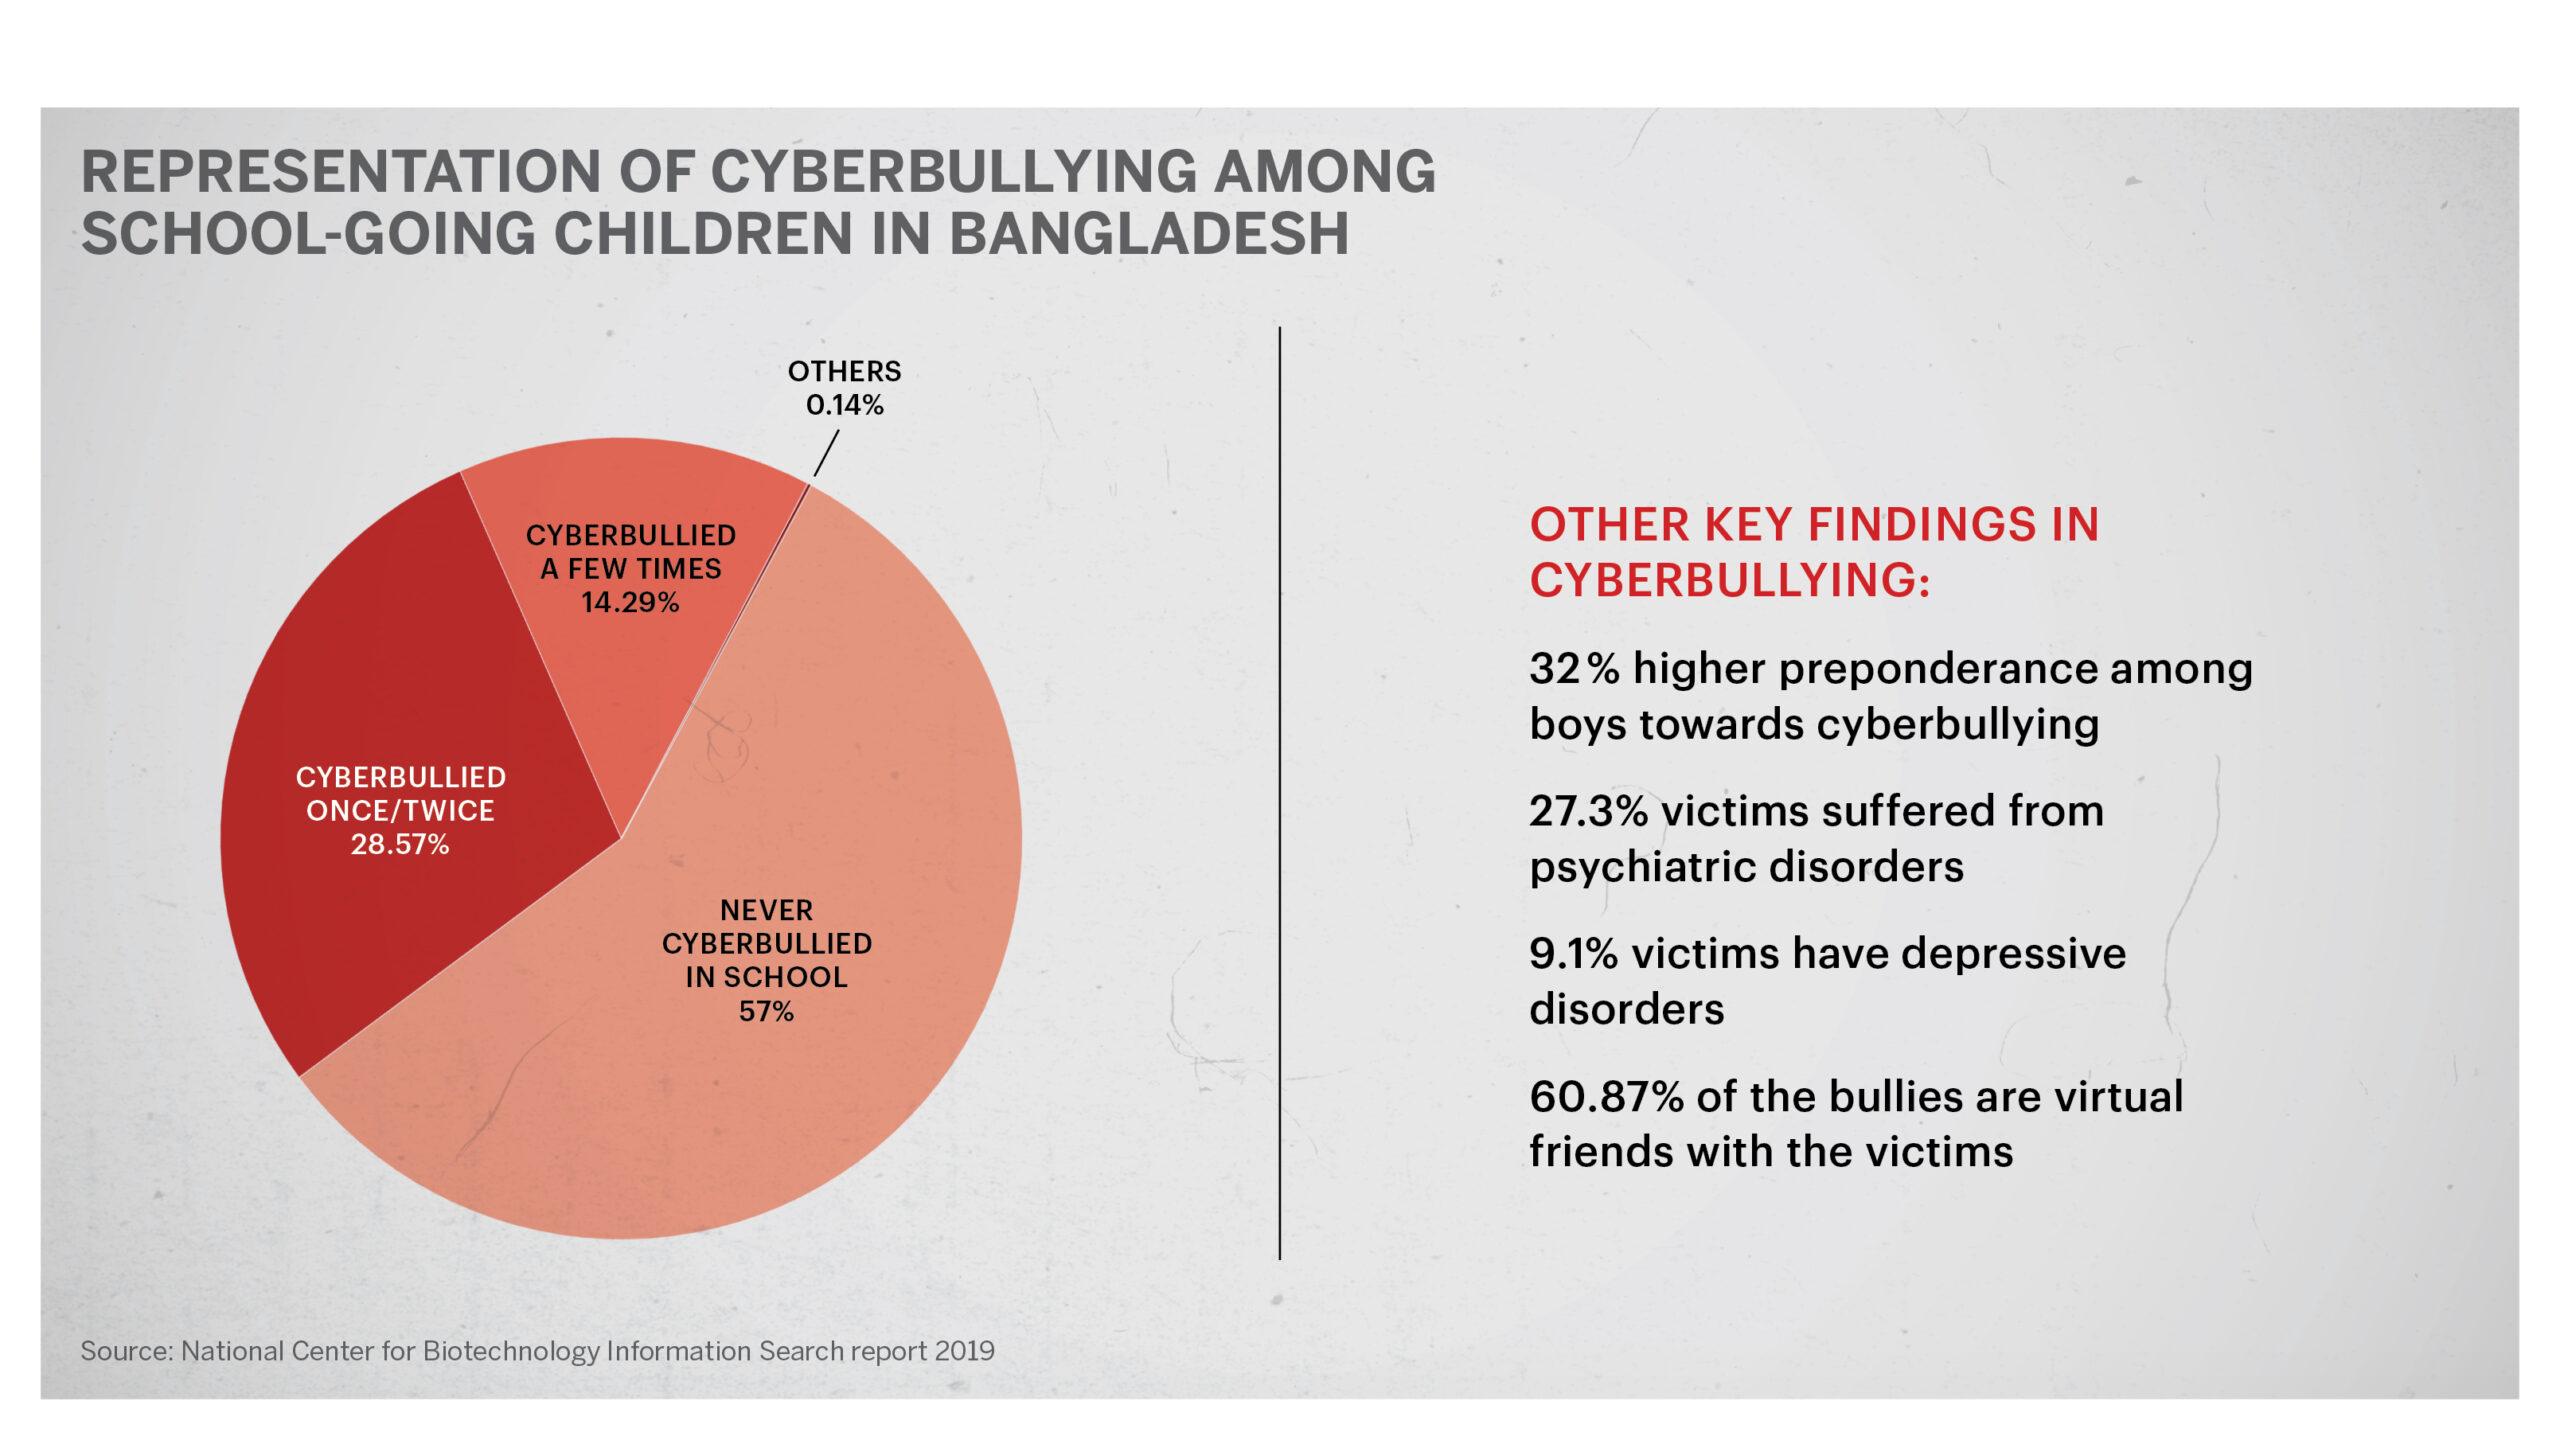 Representation of Cyberbullying